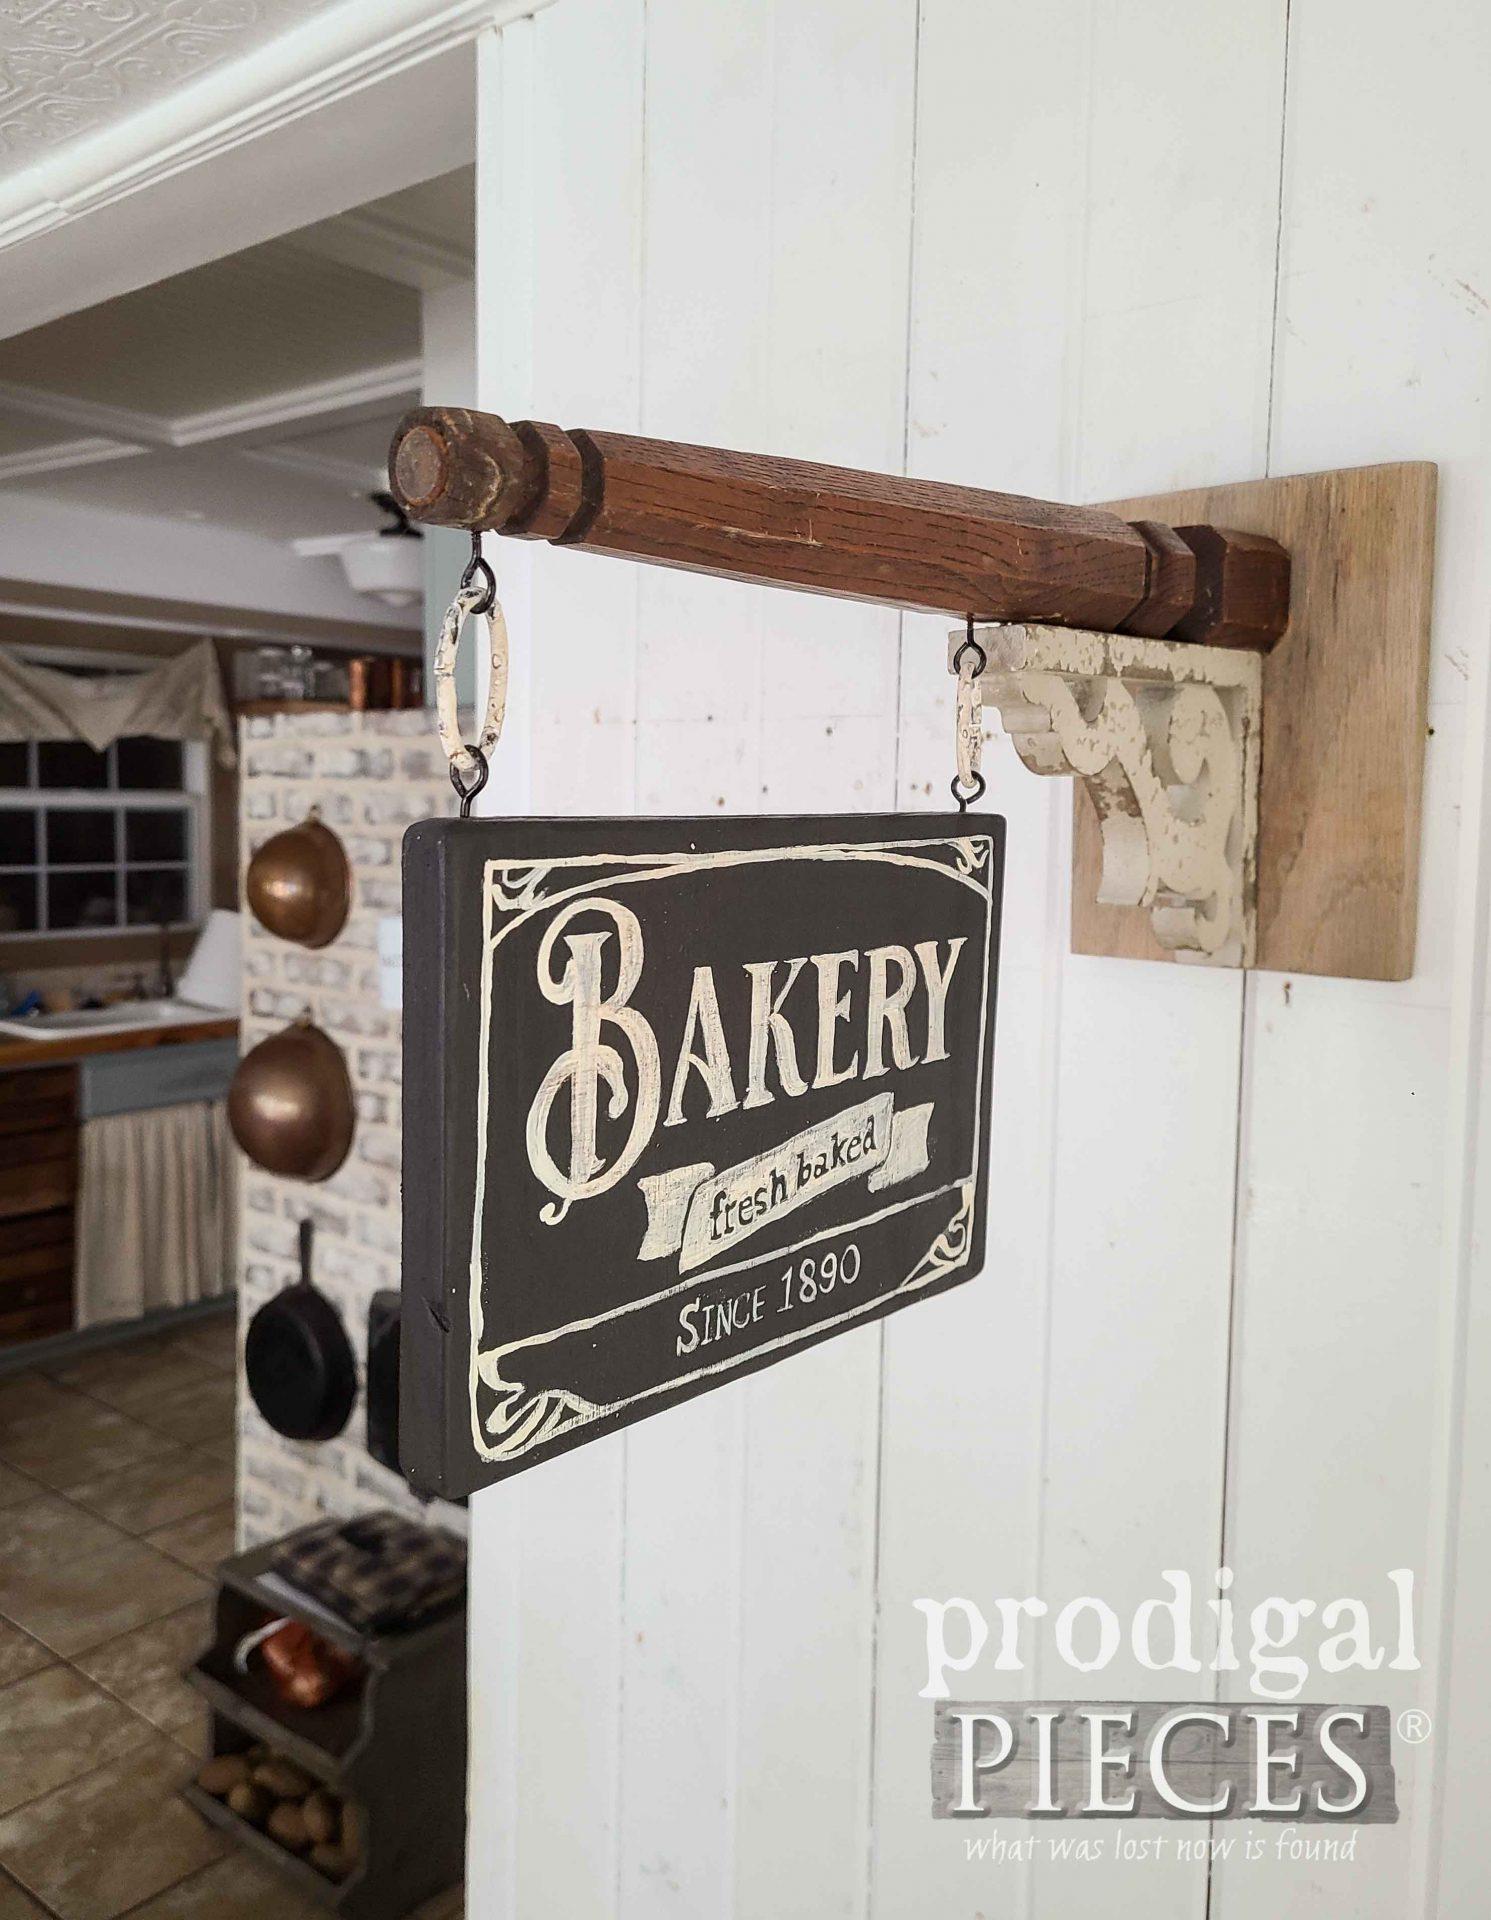 Farmhouse Kitchen Decor Baking Sign by Larissa of Prodigal Pieces | prodigalpieces.com #prodigalpieces #farmhouse #home #diy